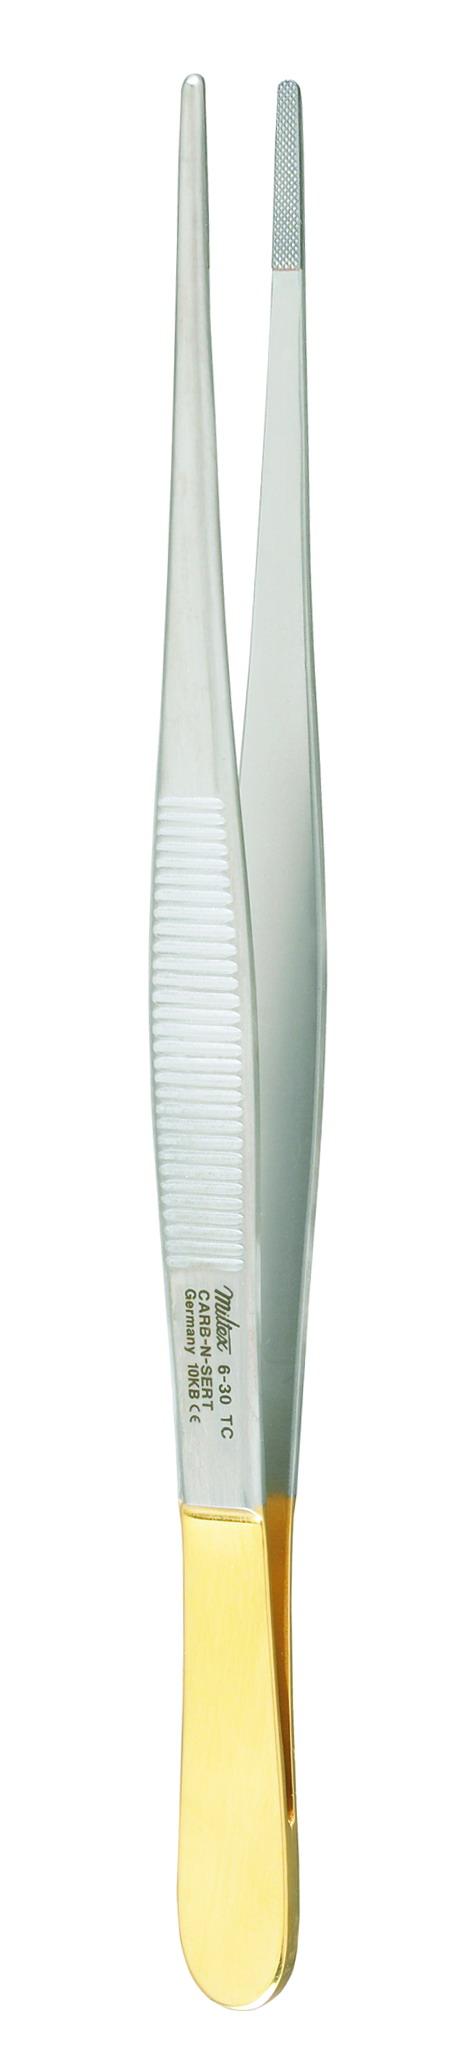 carb-n-sert-dressing-forceps-6-152-cm-cross-serrated-tips-6-30tc-miltex.jpg